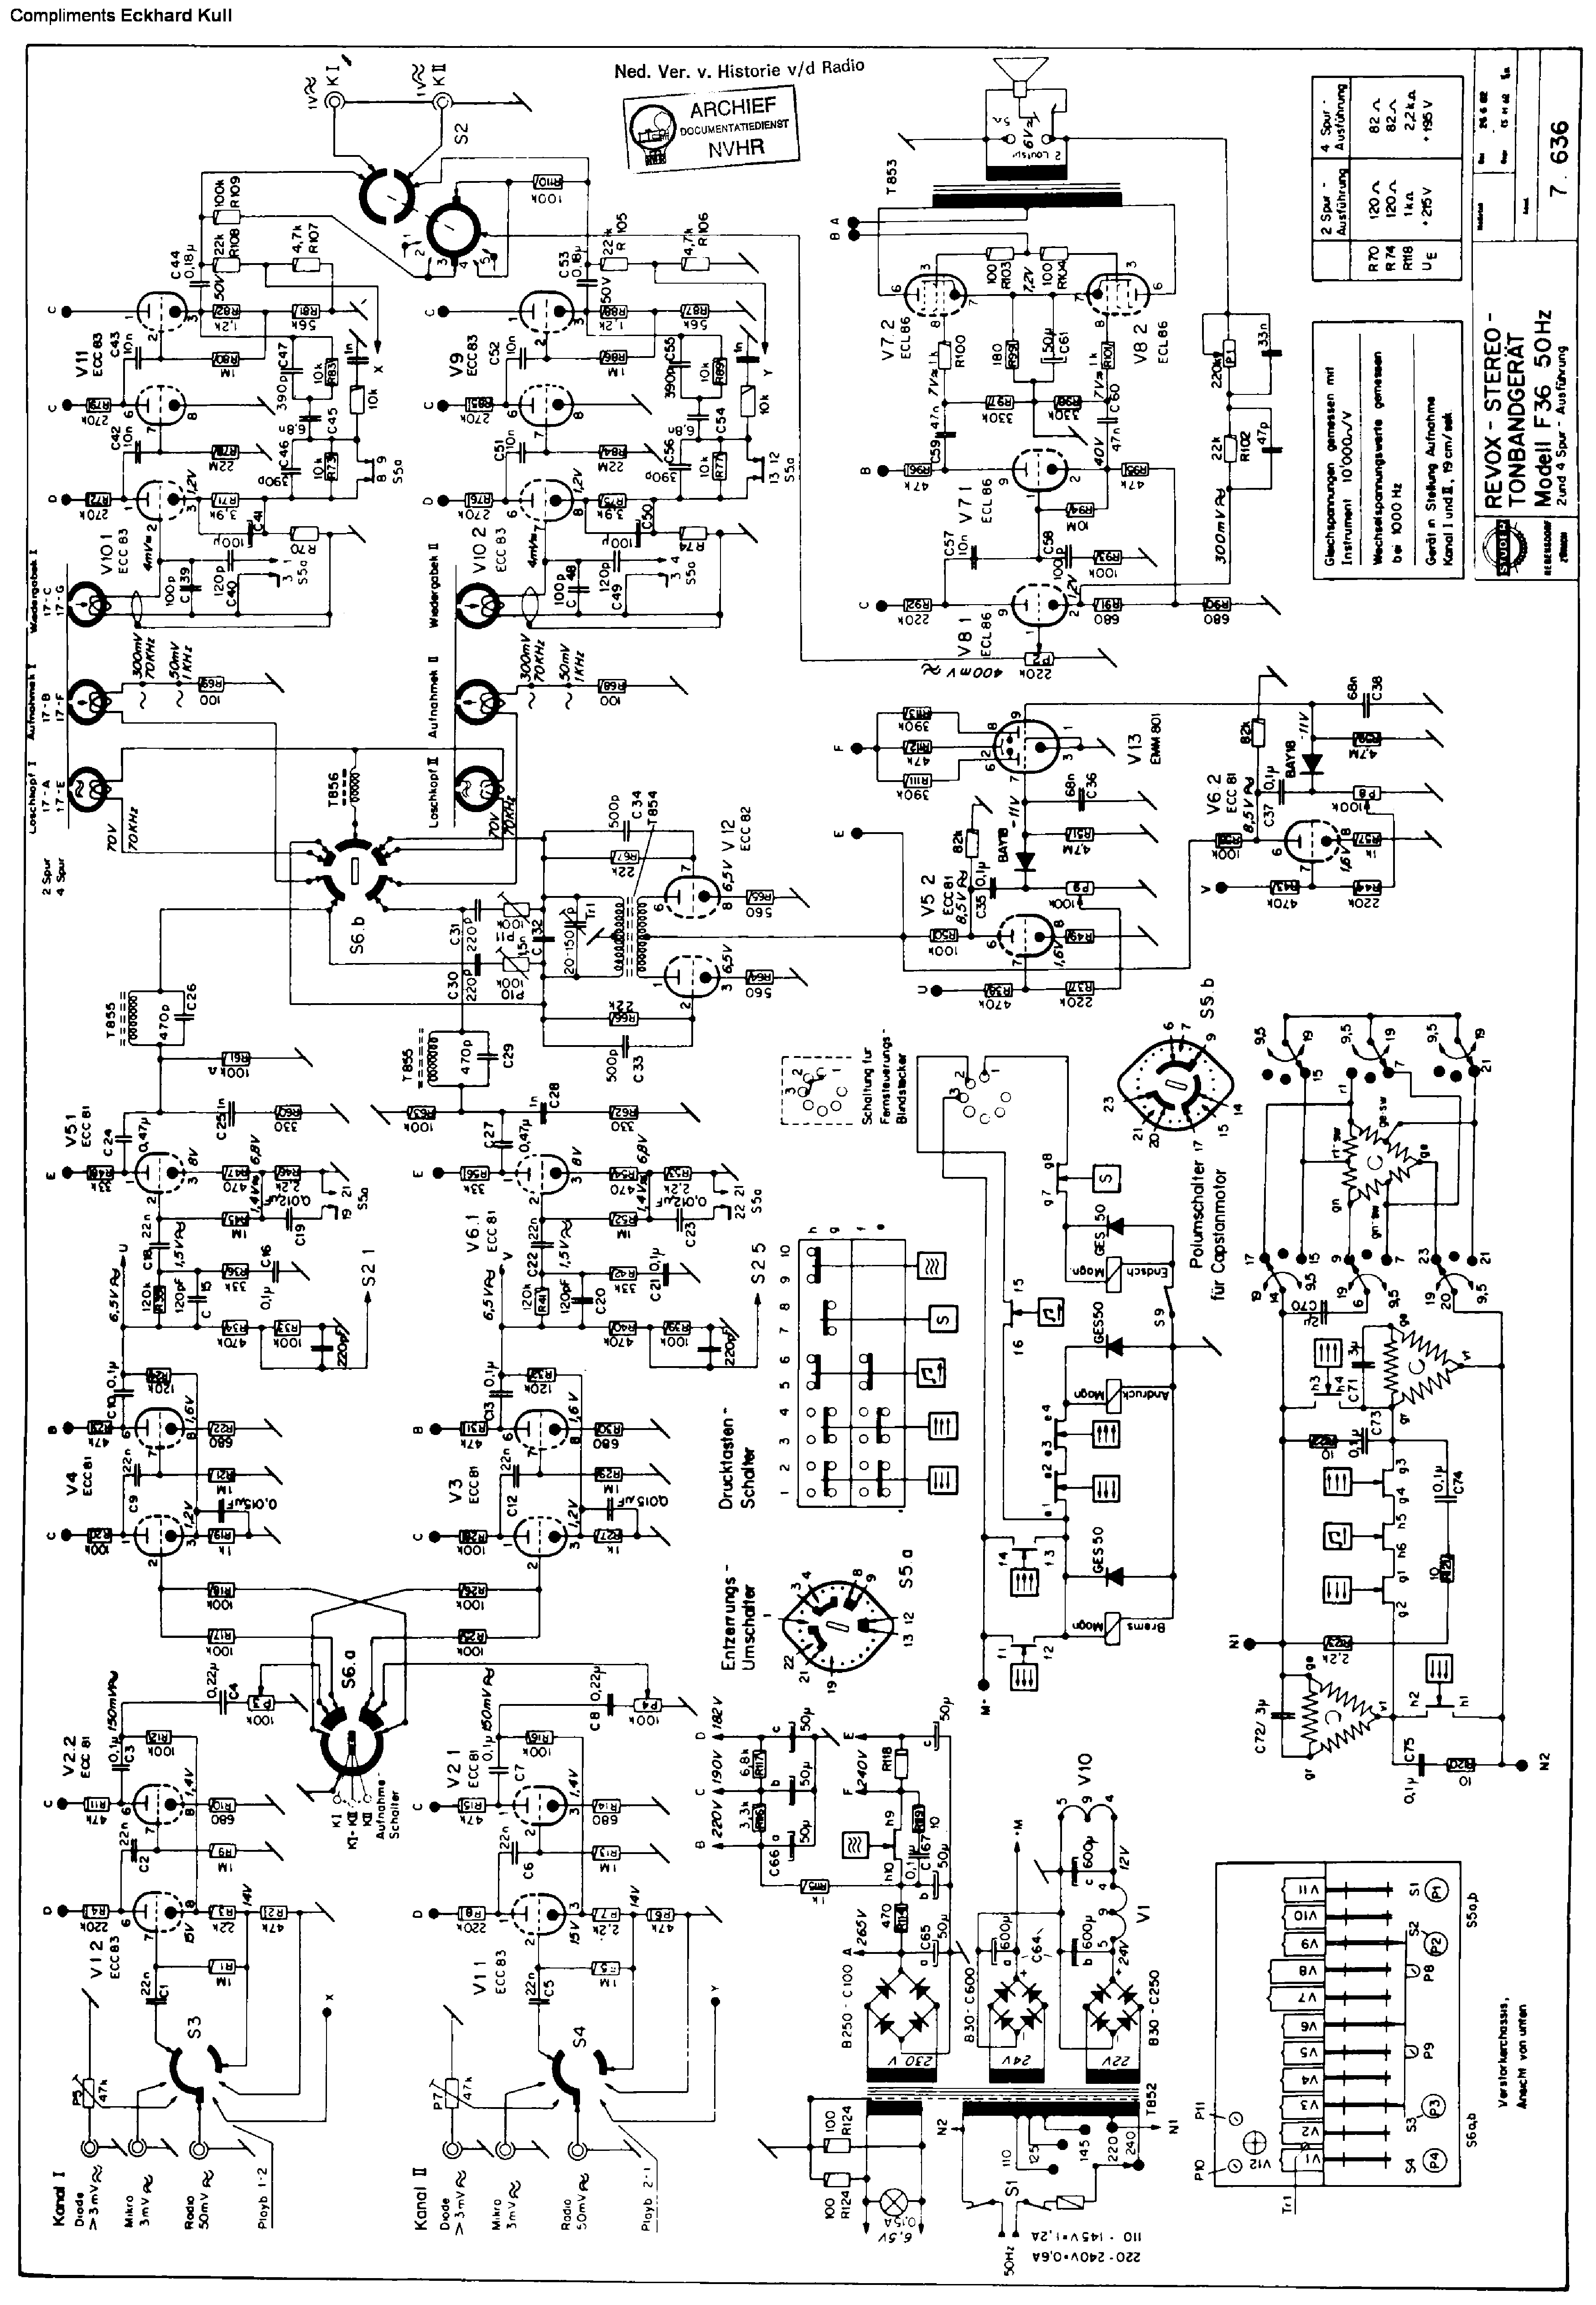 revox g36 tape sch service manual download  schematics